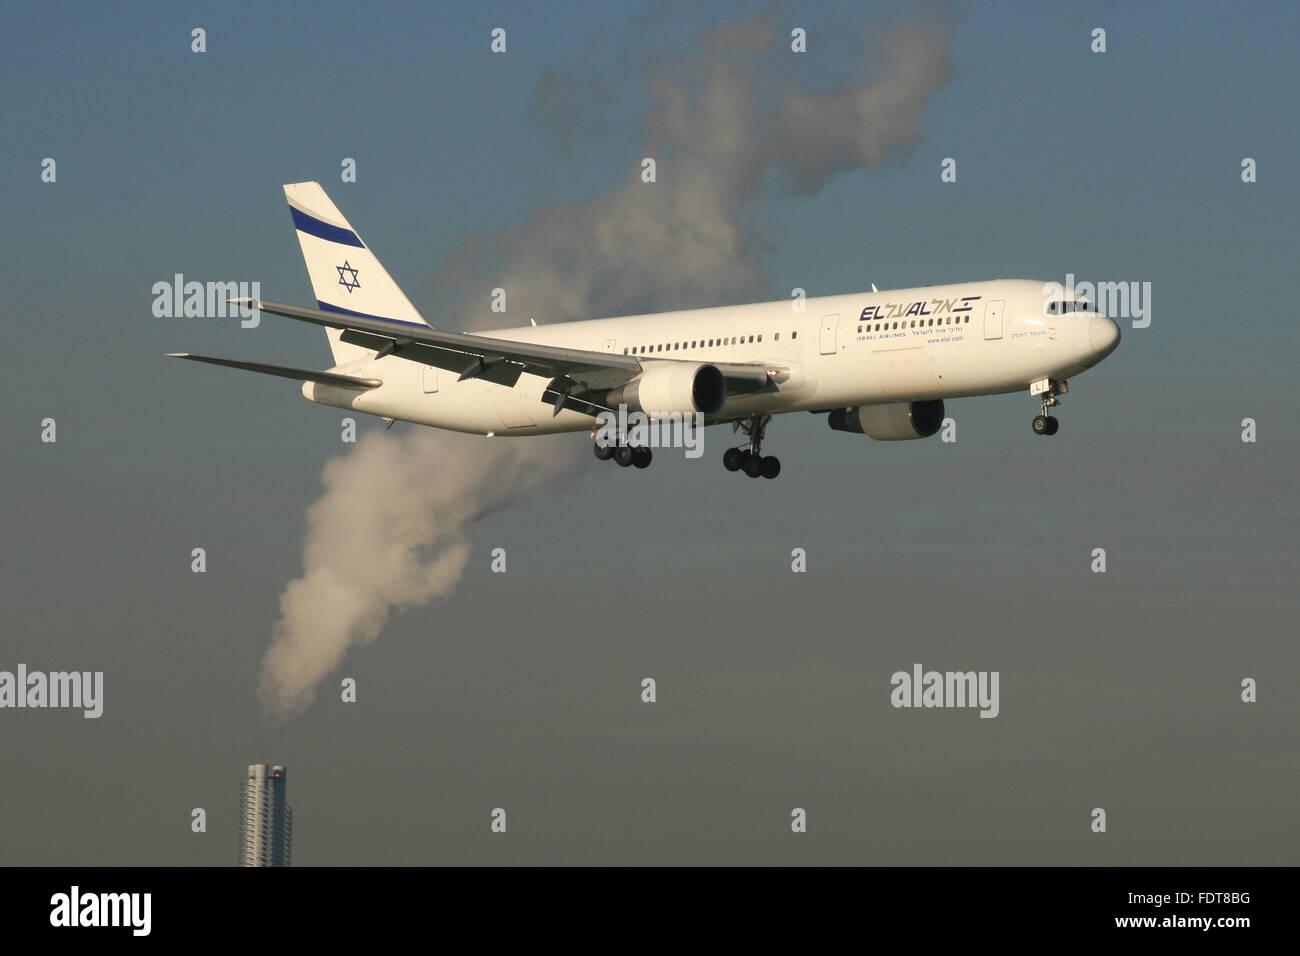 Plan de la POLLUTION C02 Photo Stock